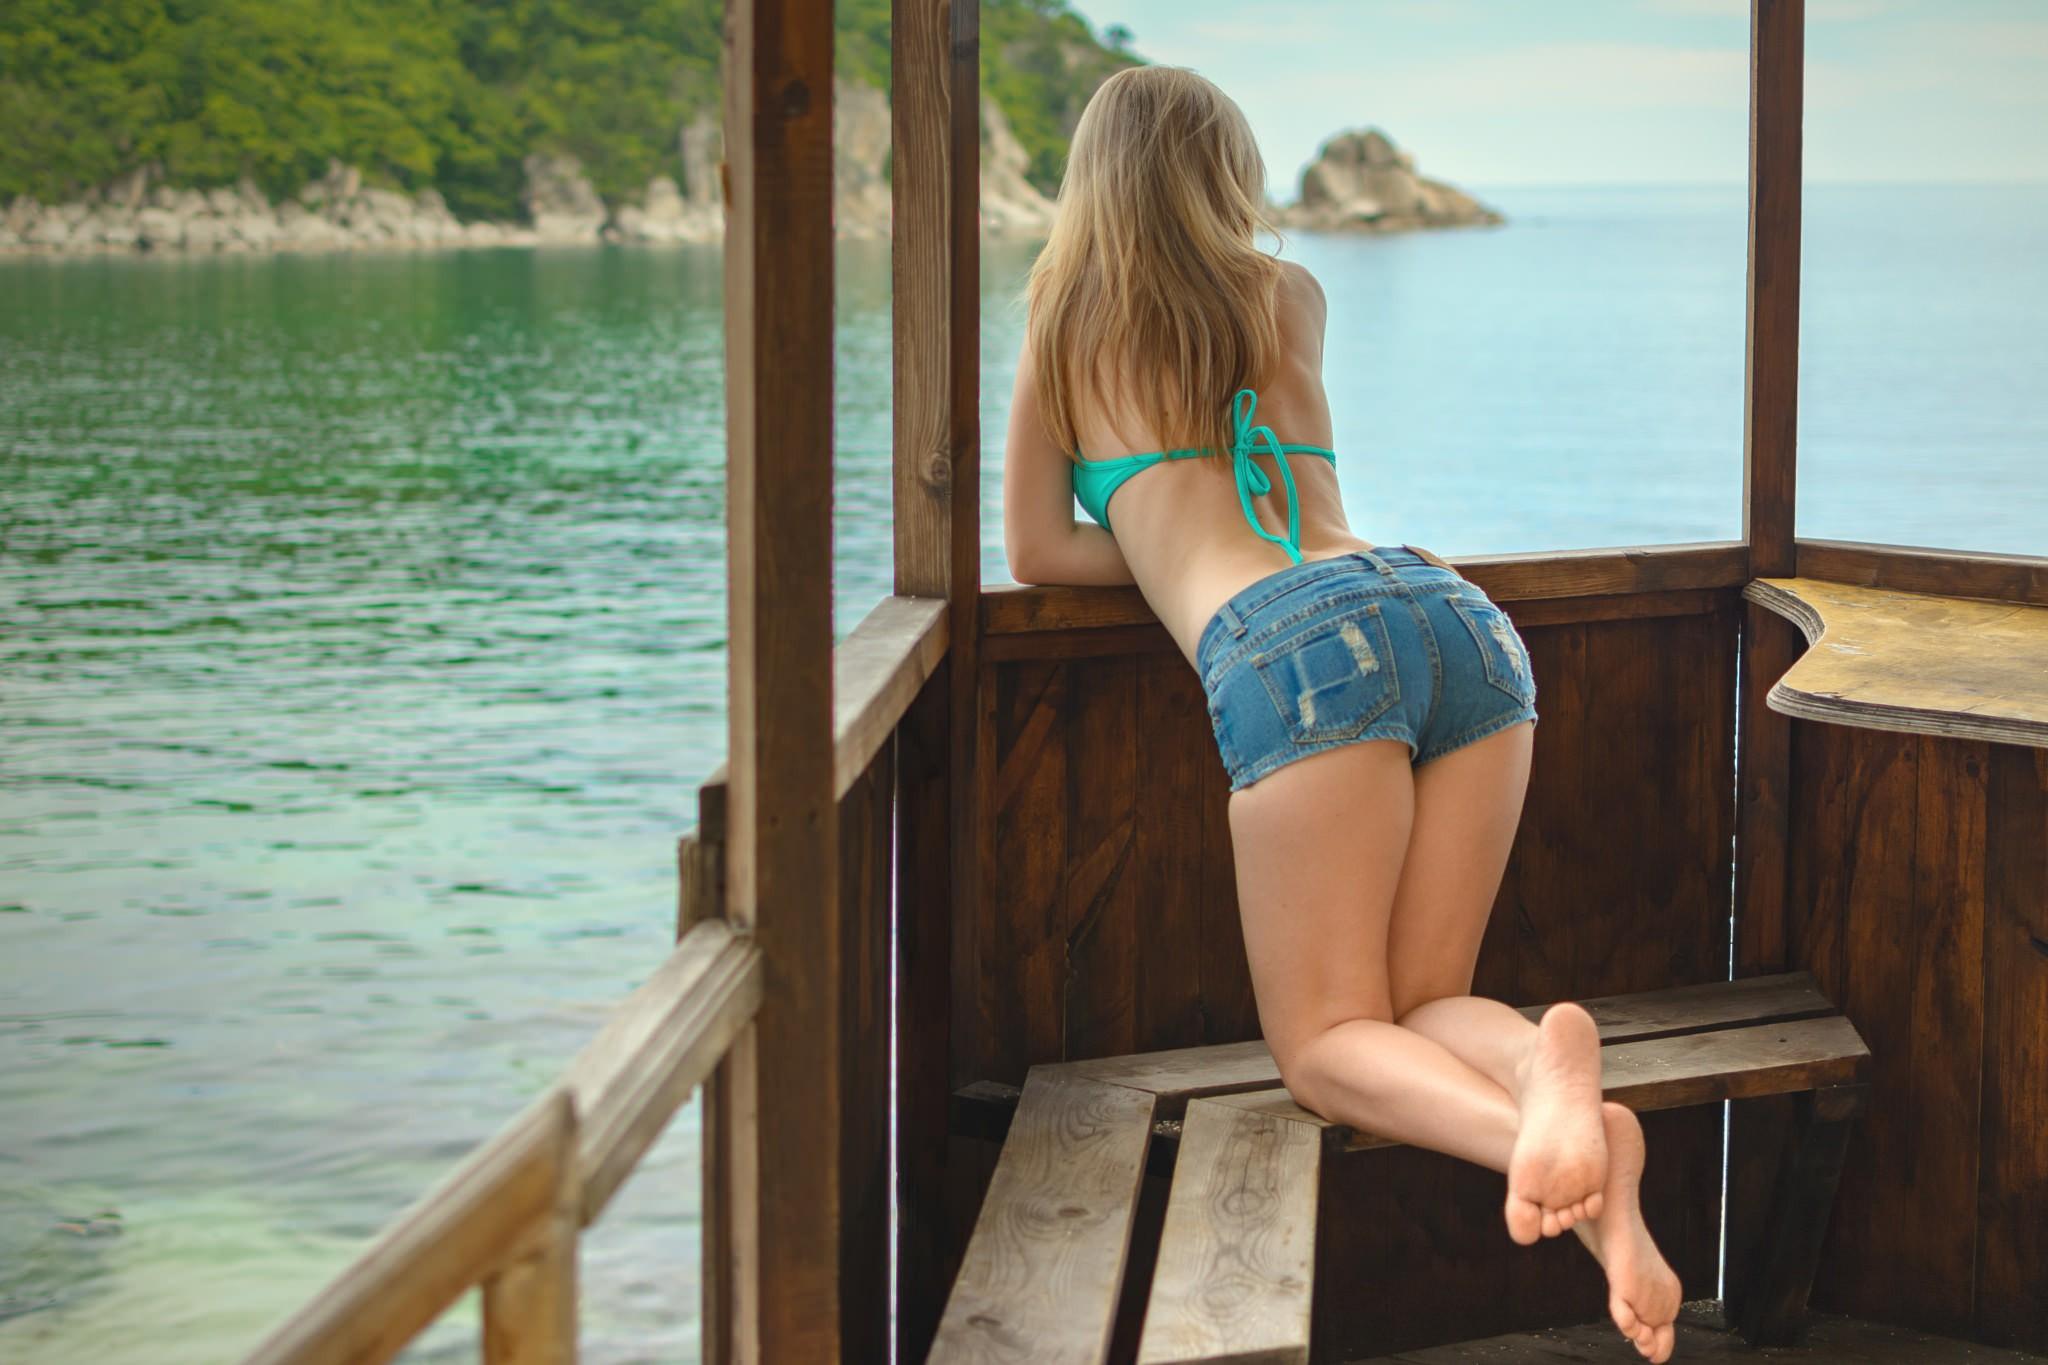 Hot girls bending over shorts asian porn wives